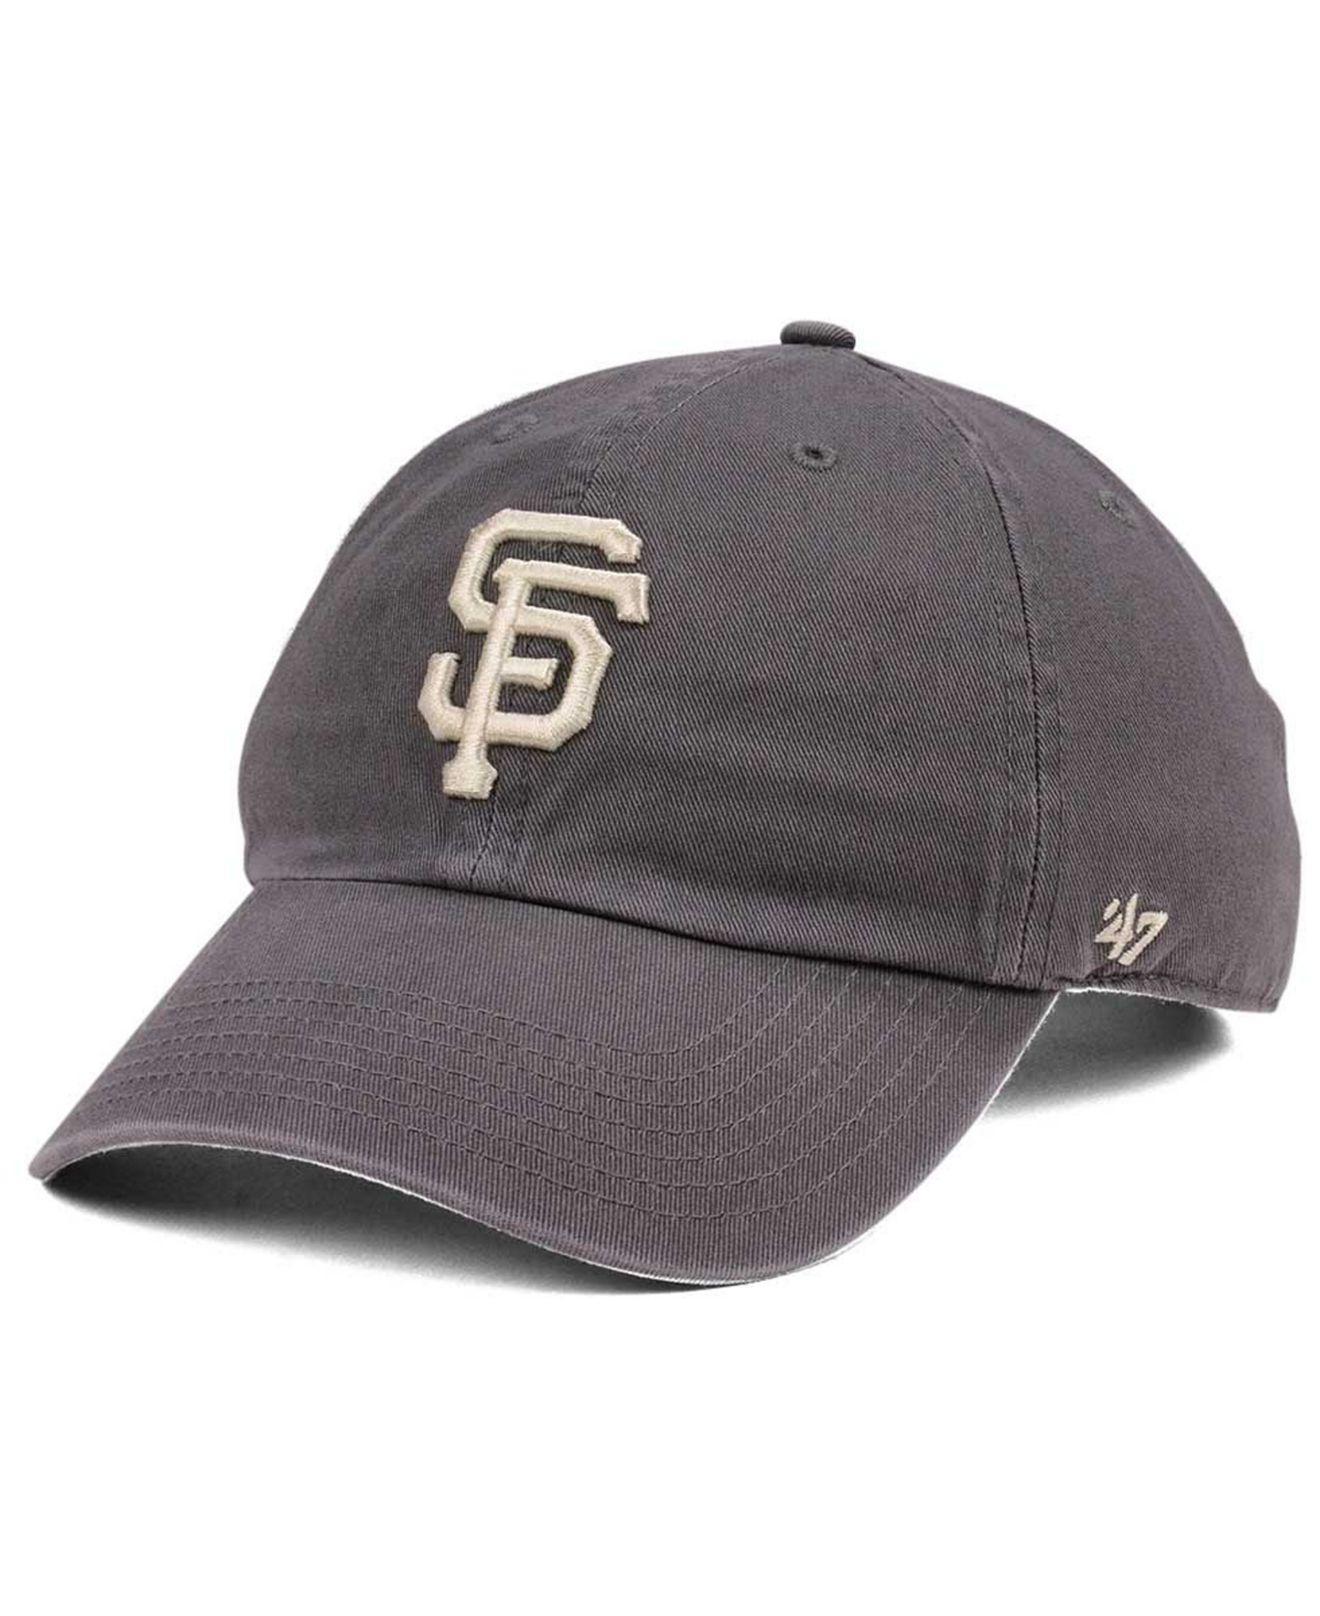 27e5e03182efb ... inexpensive 47 brand. mens san francisco giants dark gray clean up cap  fcdb7 c735a